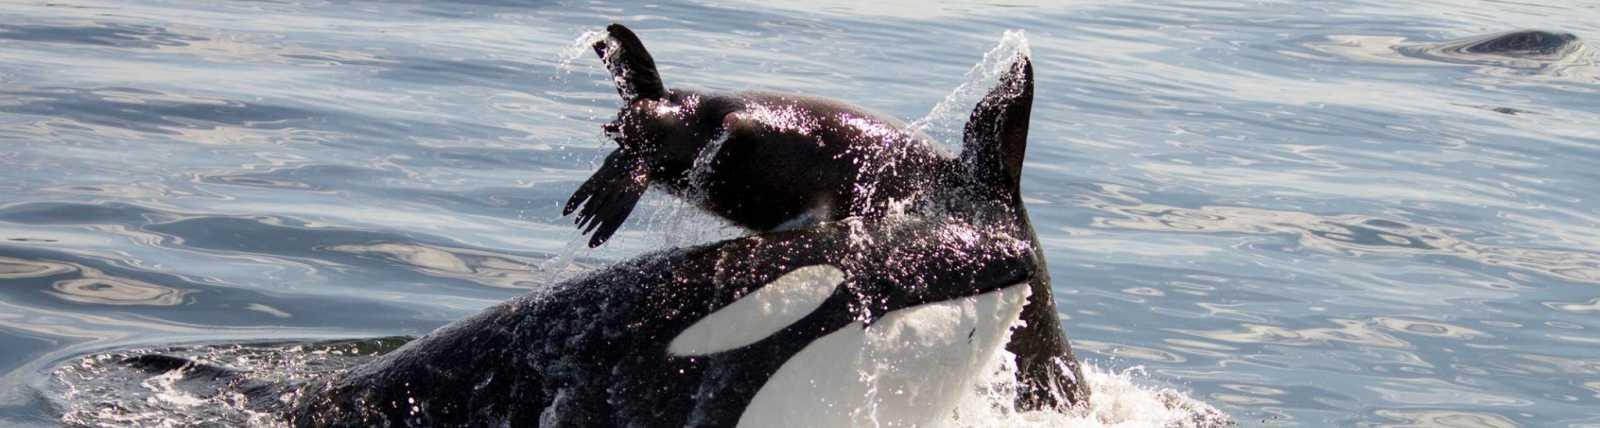 Orca Whale & Sea Lion